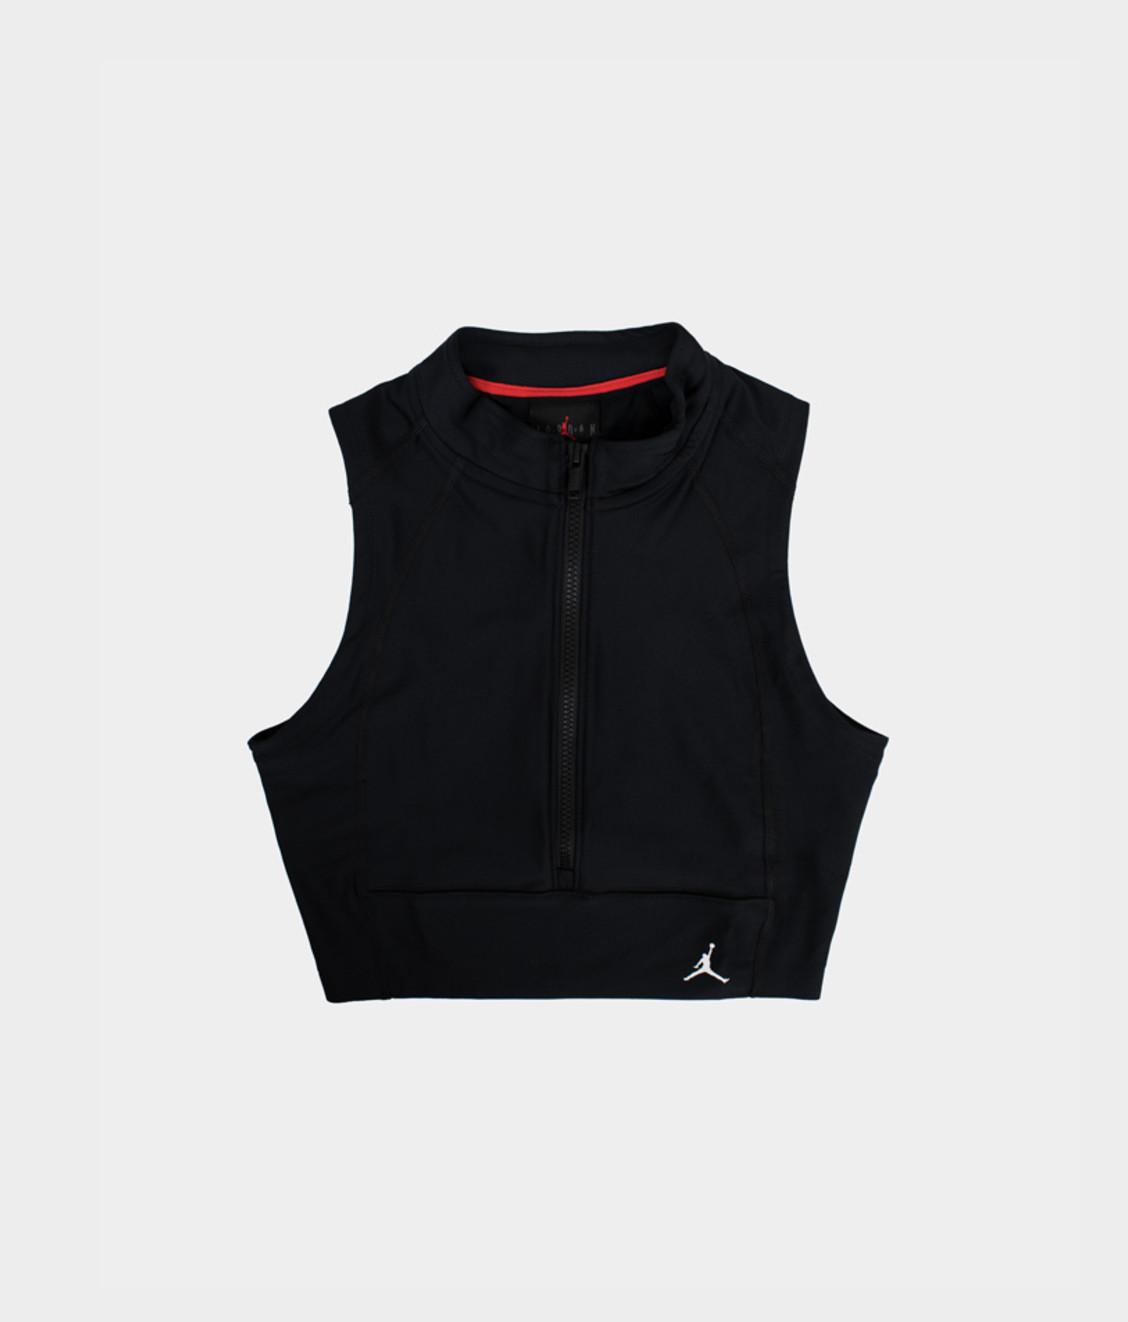 Nike Jordan Body Con Crop Top Black